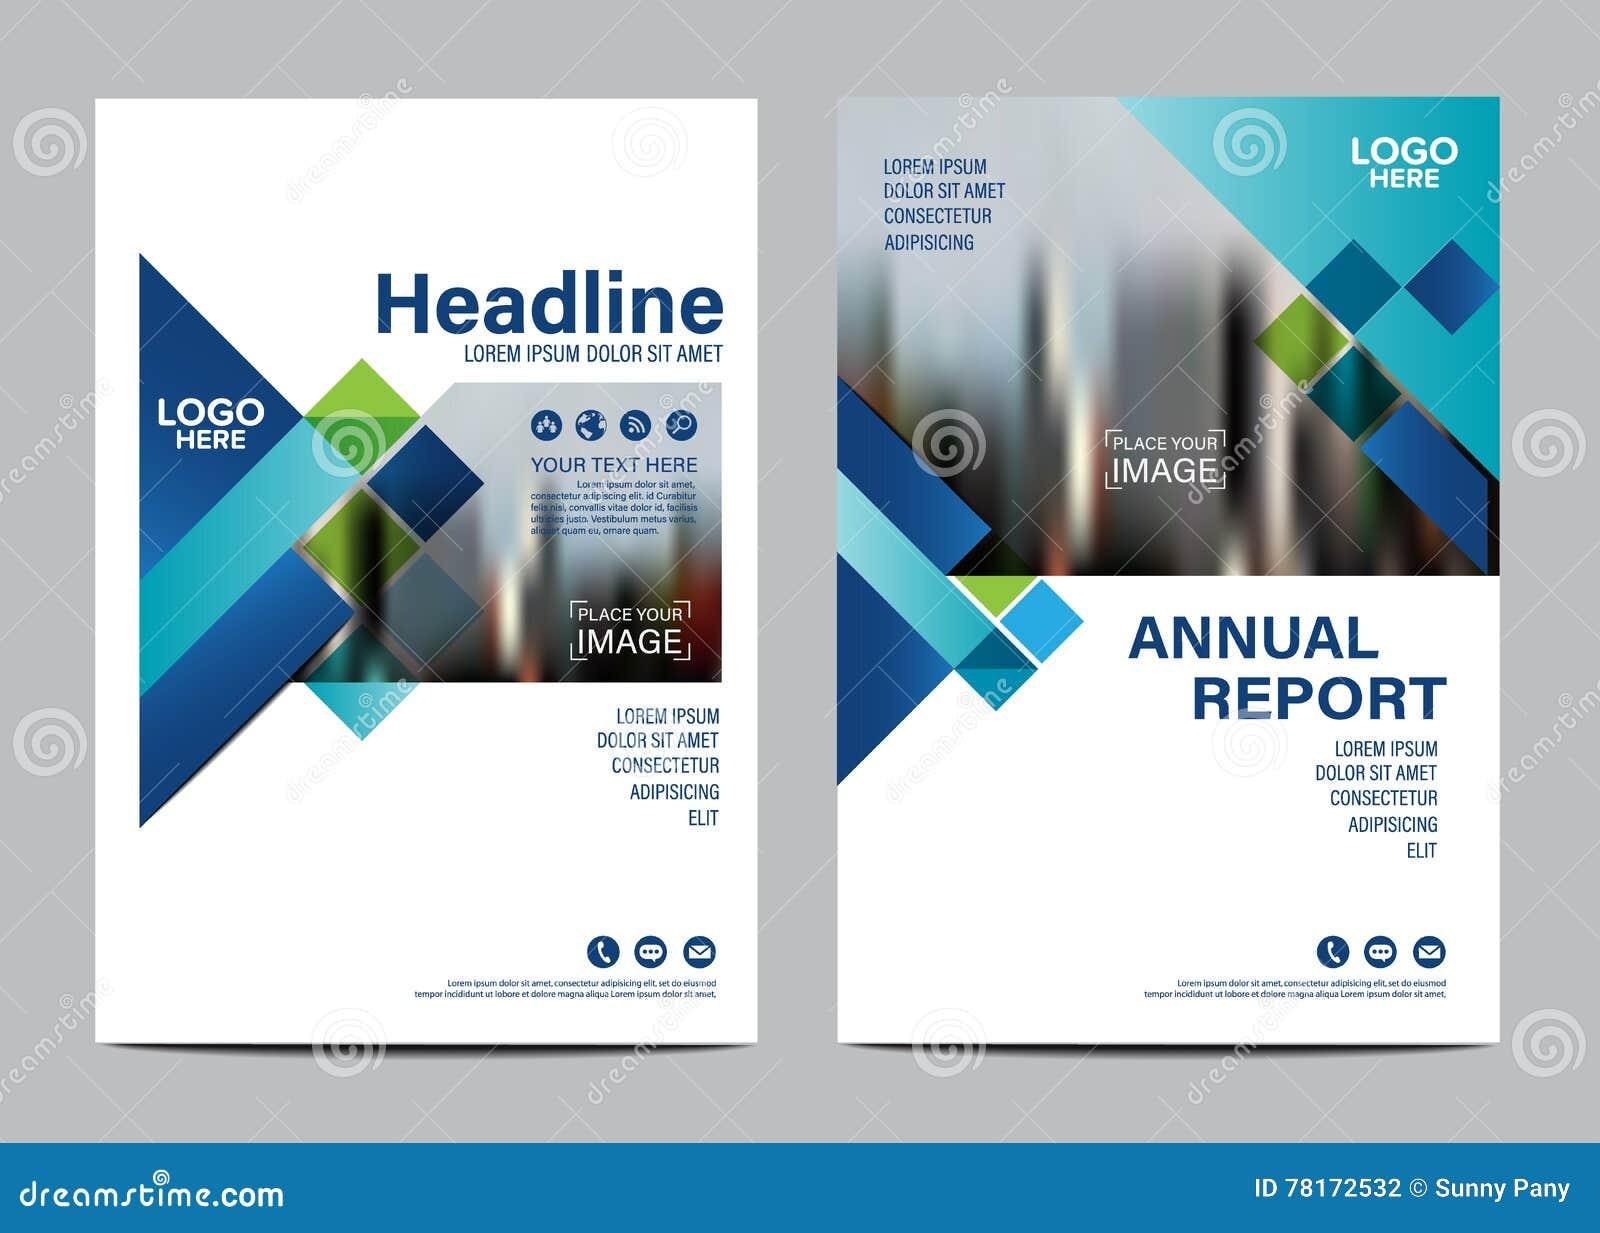 Brochure Layout design template. Annual Report Flyer Leaflet cover Presentation Modern background. illustration vector in A4